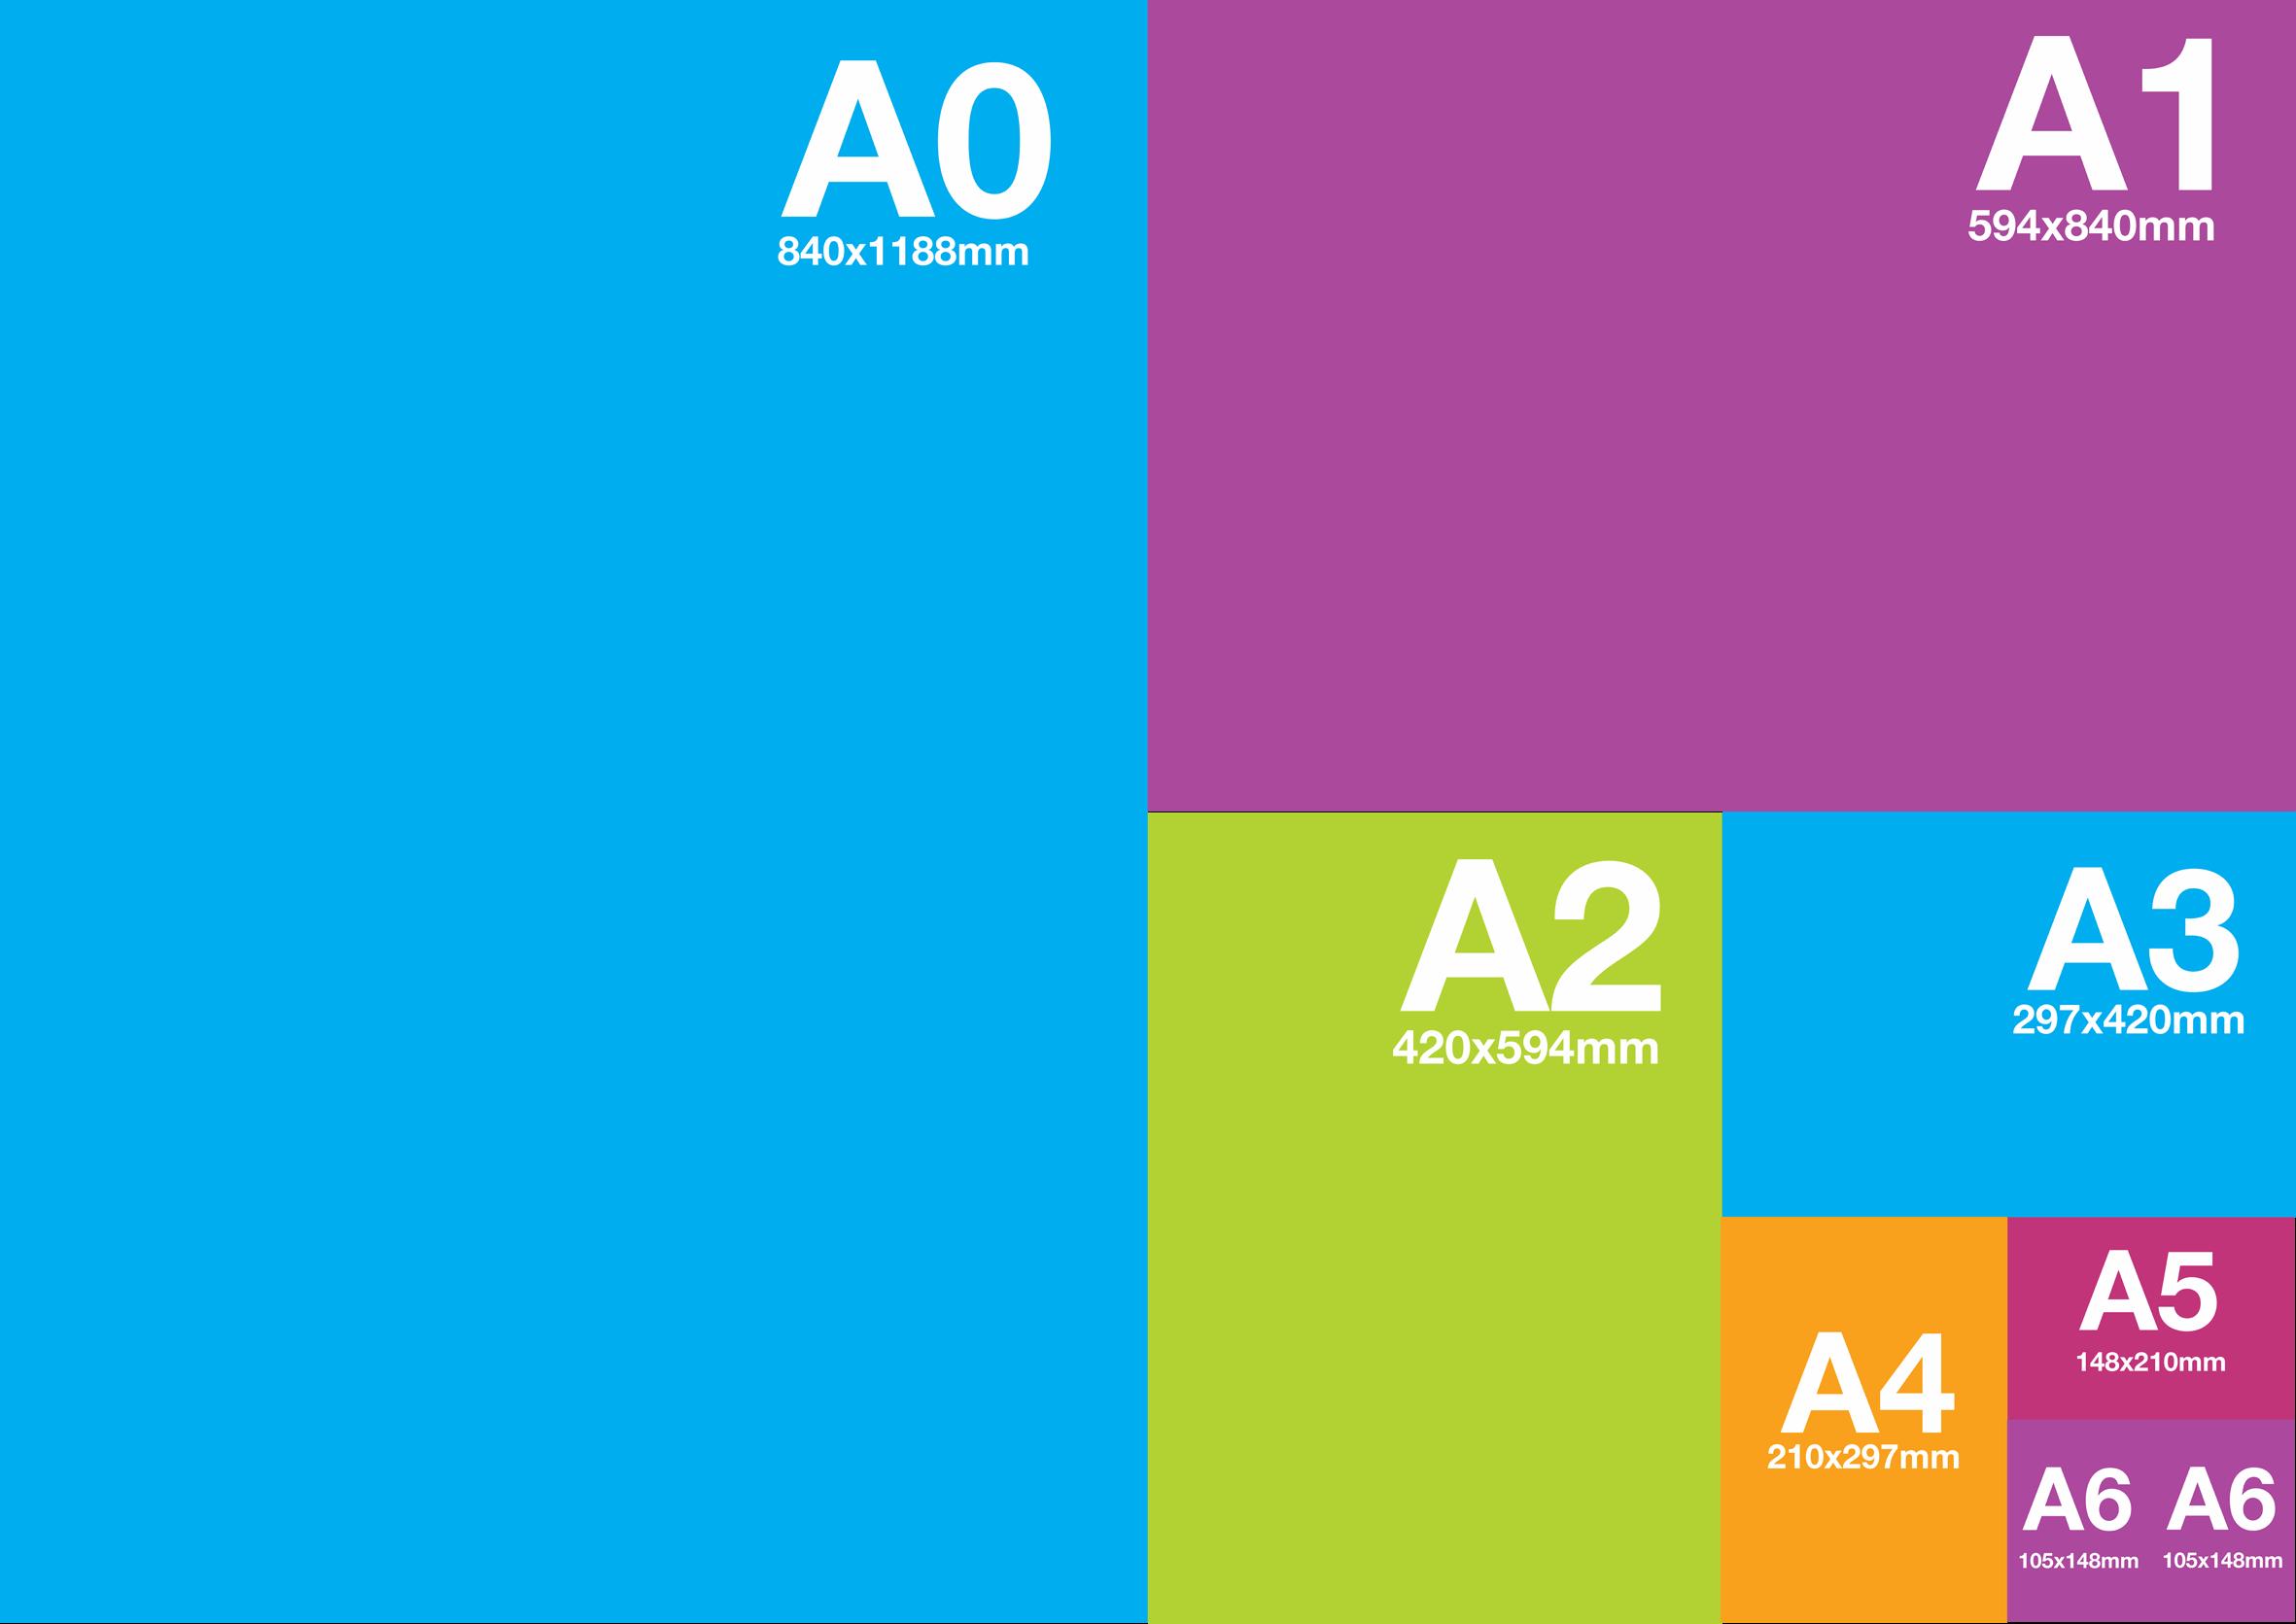 Открытка картинка, размер картинки а3